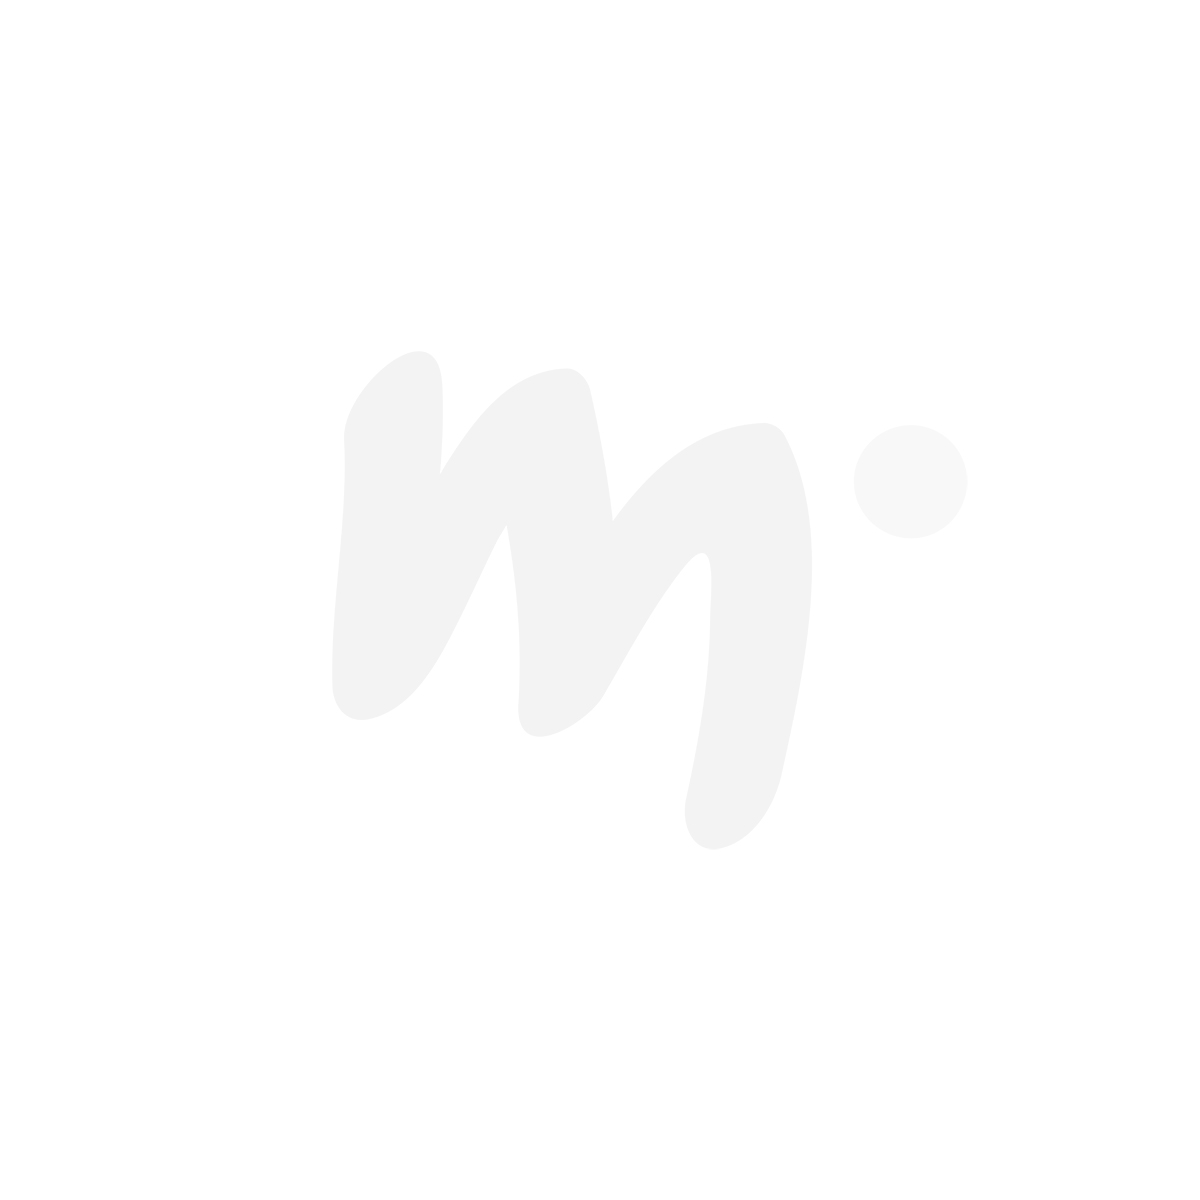 Moomin Tricks Overall teal